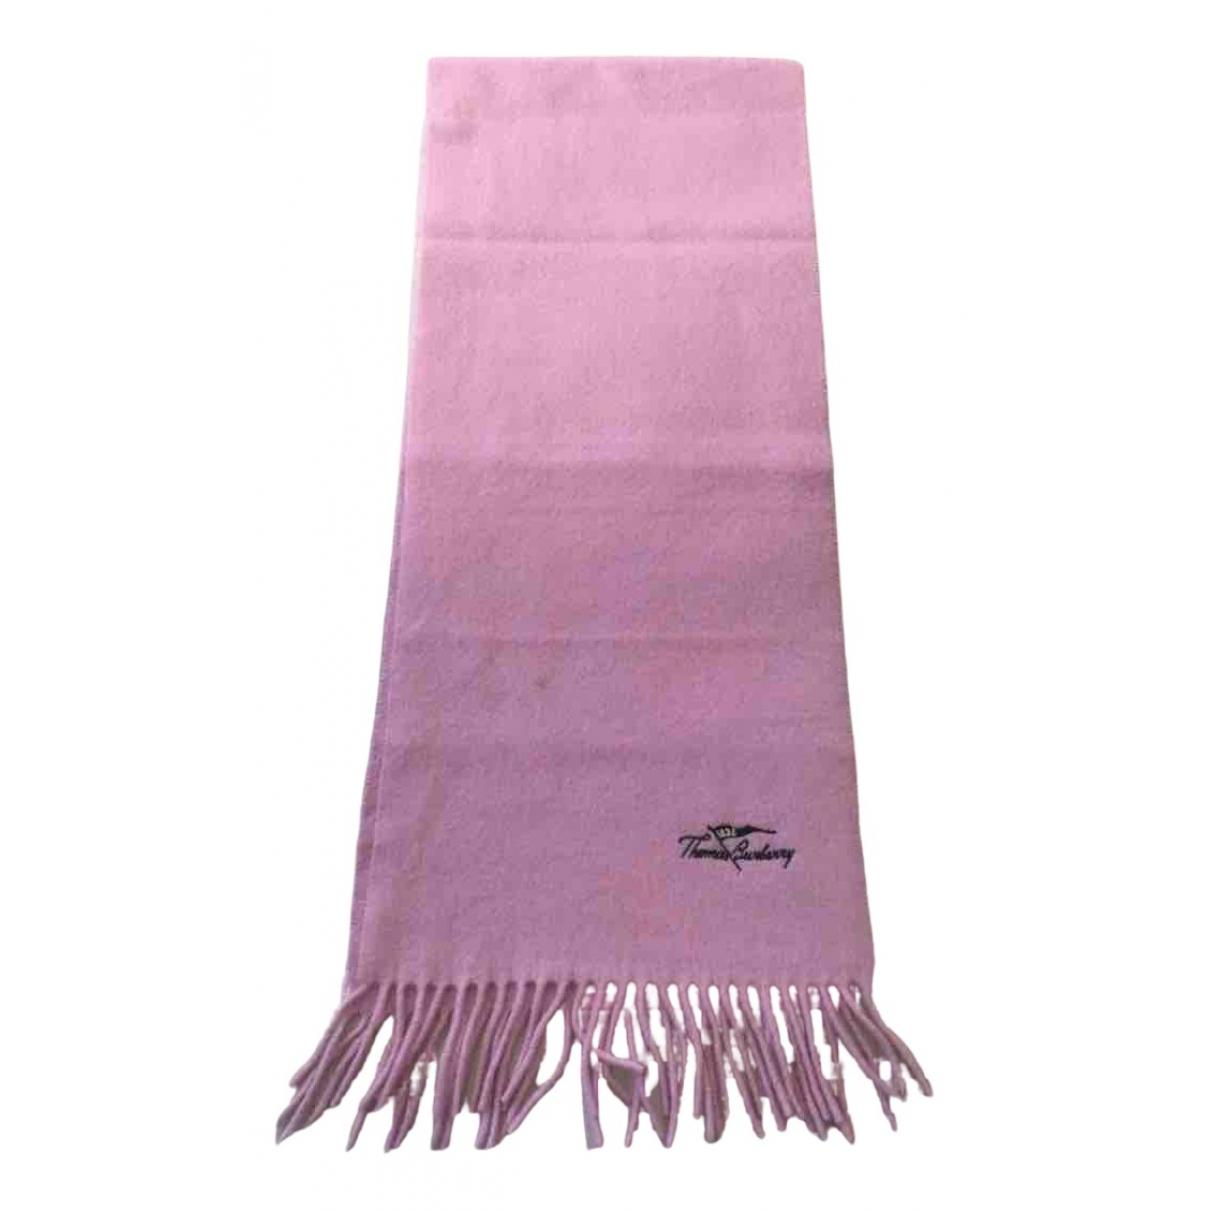 Burberry N Pink Wool scarf for Women N